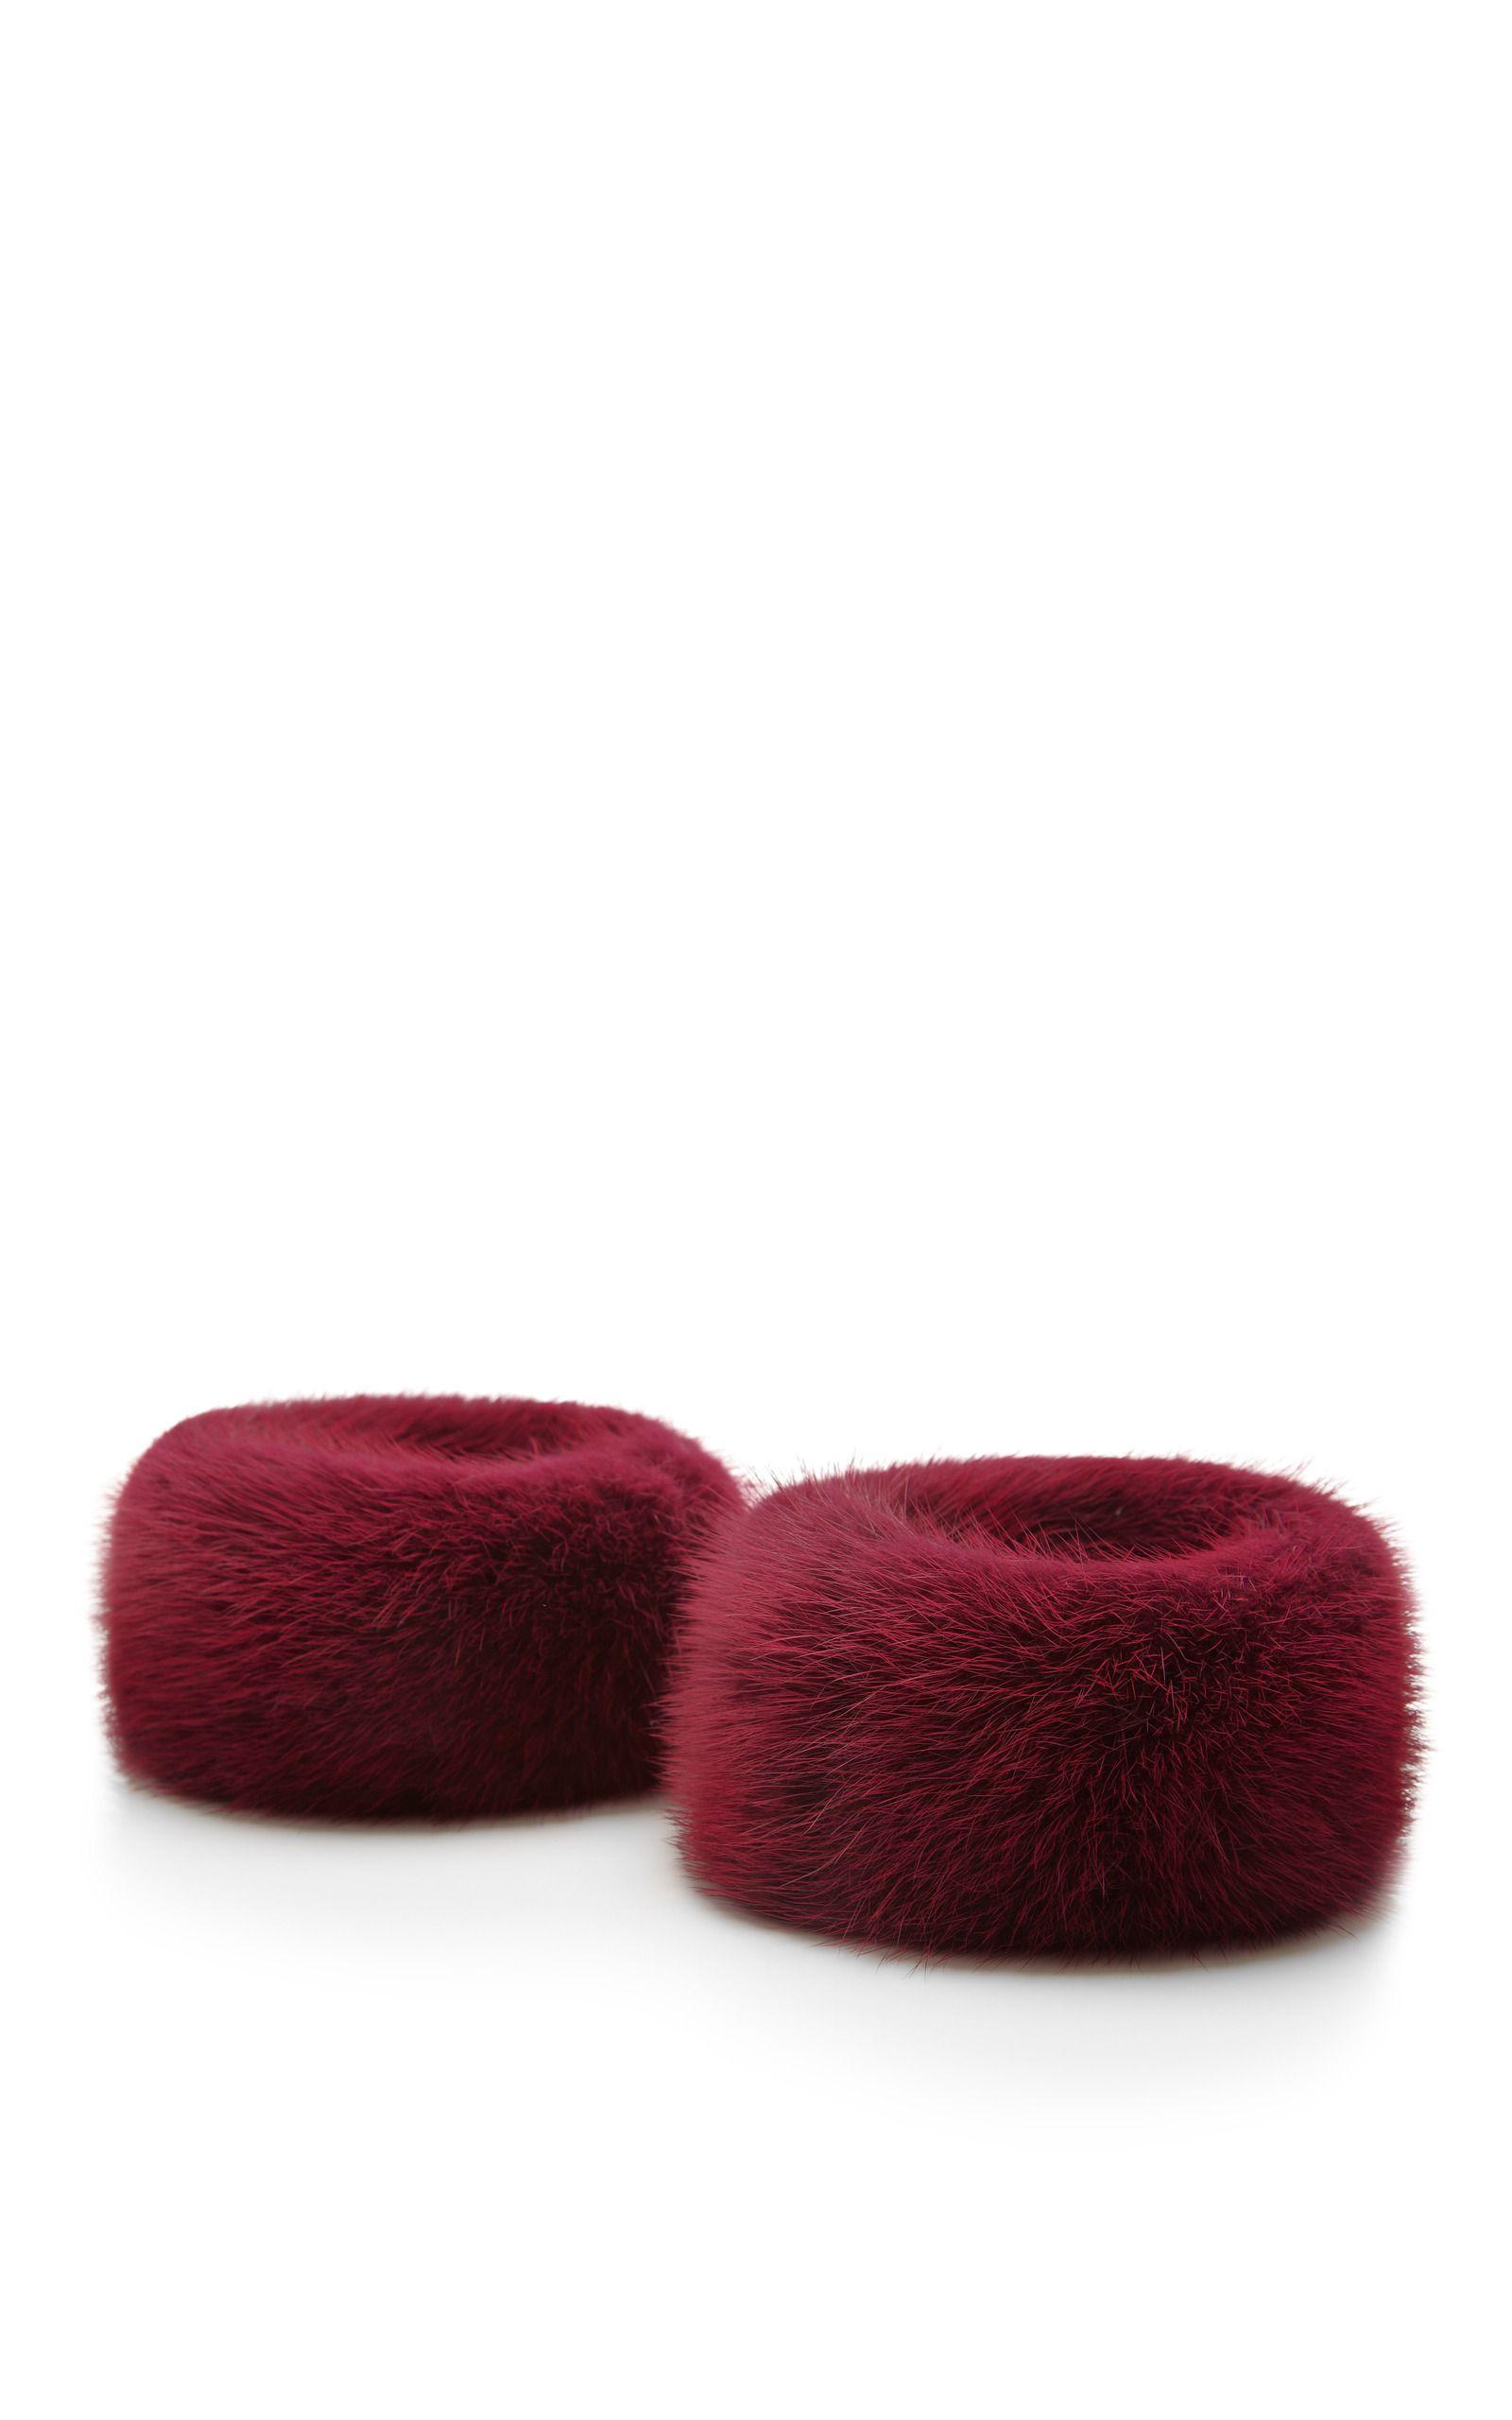 https://www.modaoperandi.com/esme-vie-fw14/viola-mink-fur-cuffs